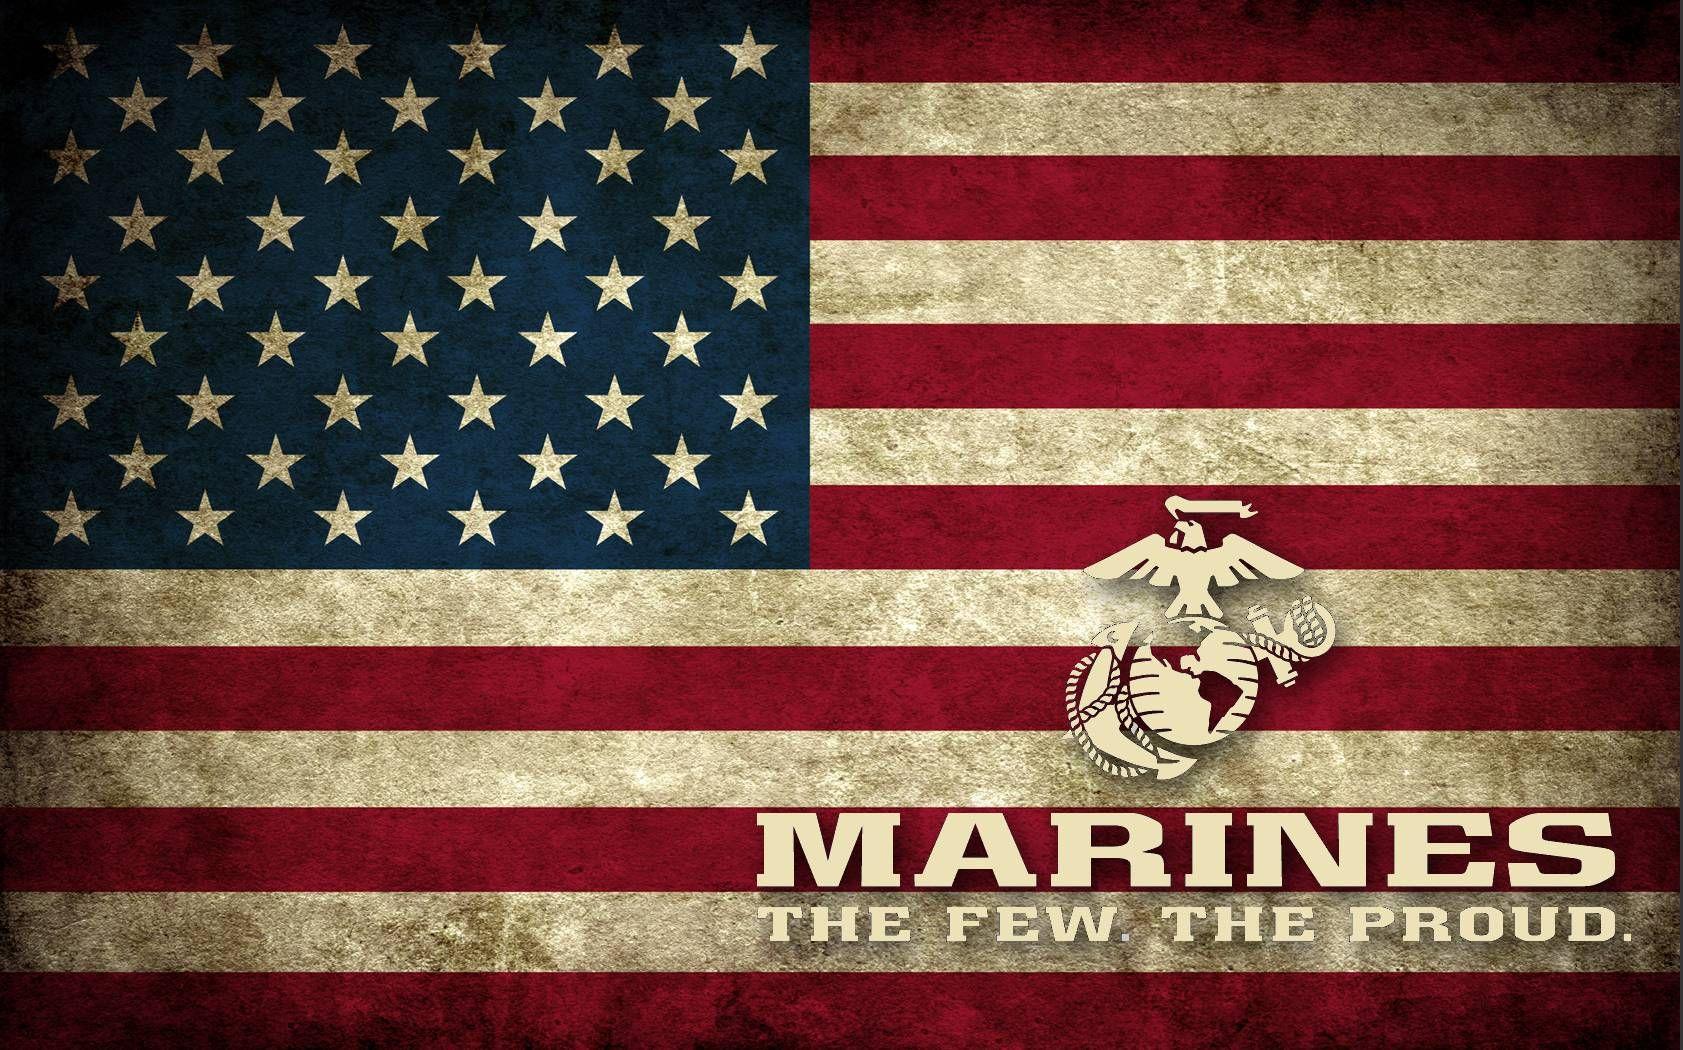 Marine Corps Wallpaper Collection 800×500 Us marine